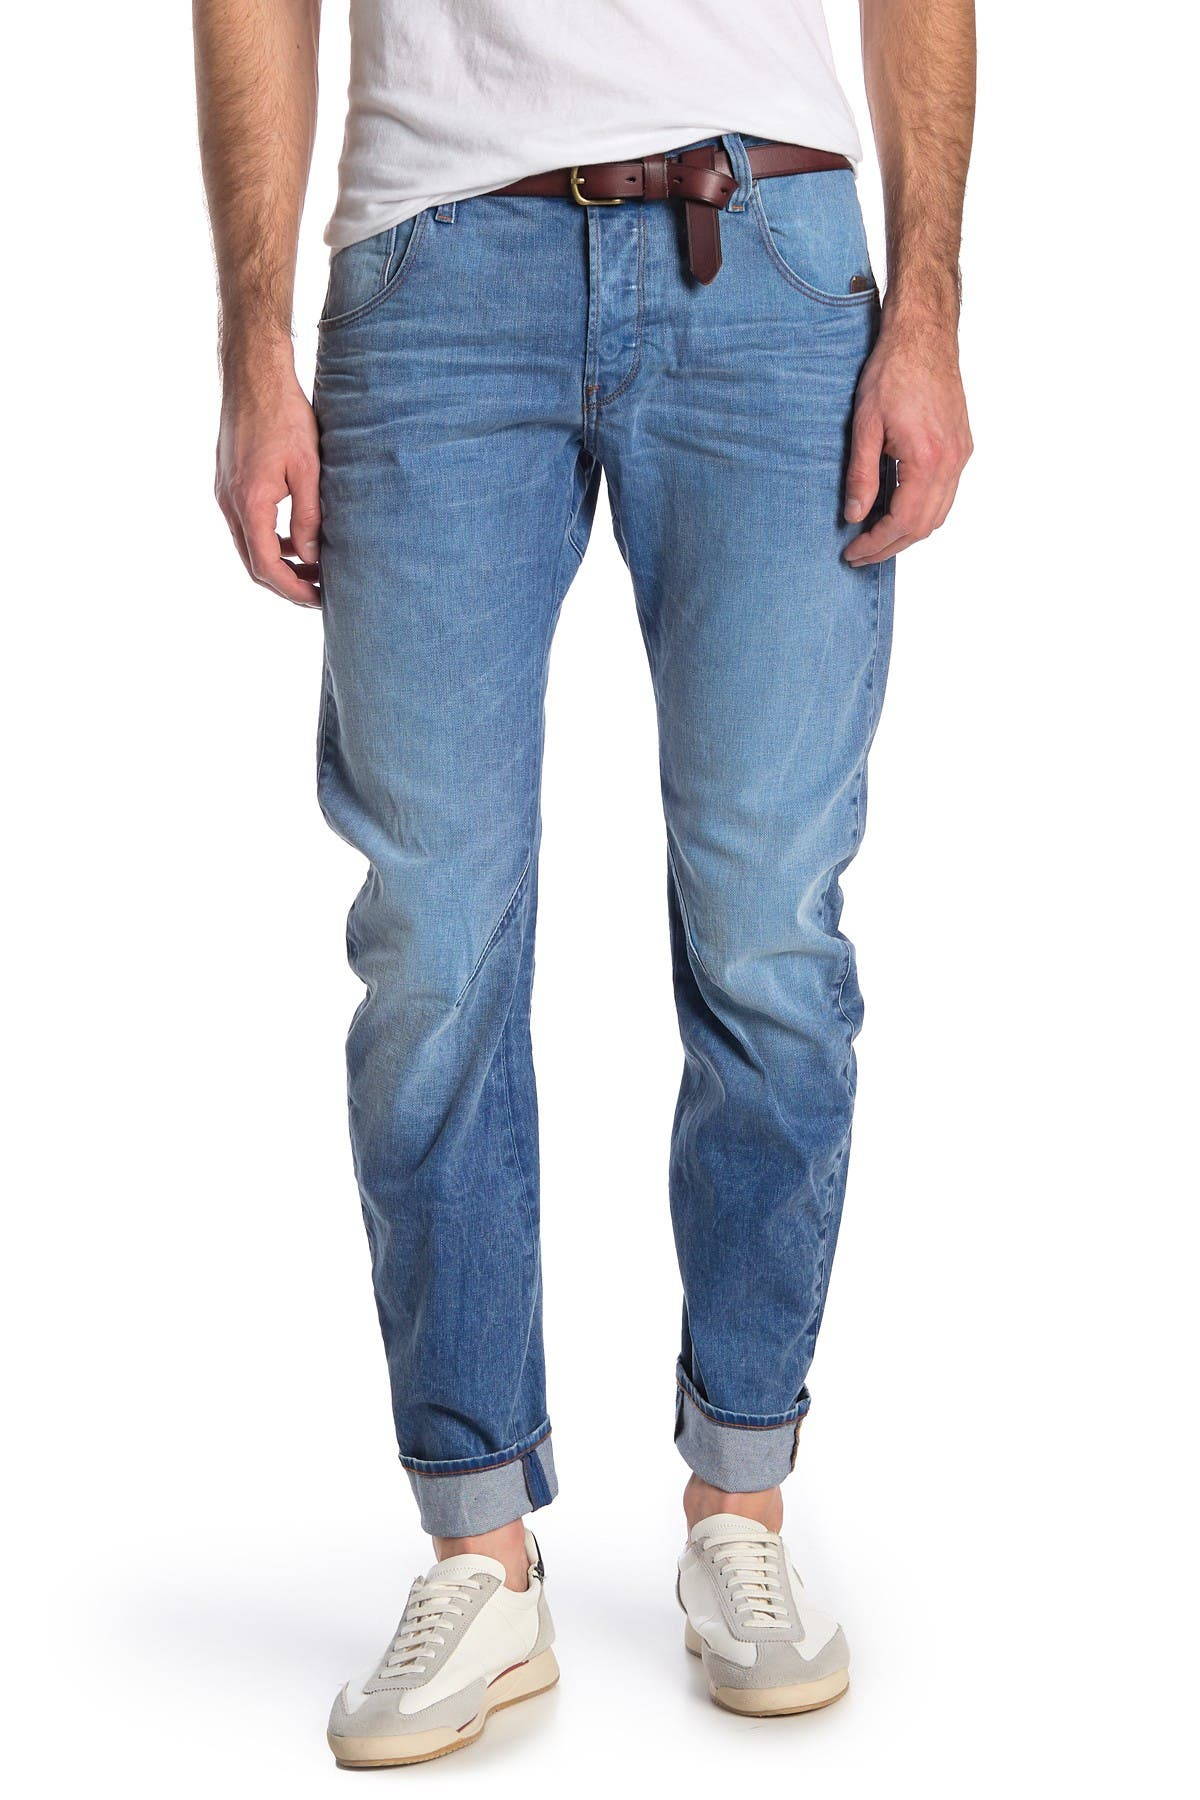 Image of G-STAR RAW Arc 3D Slim Jeans